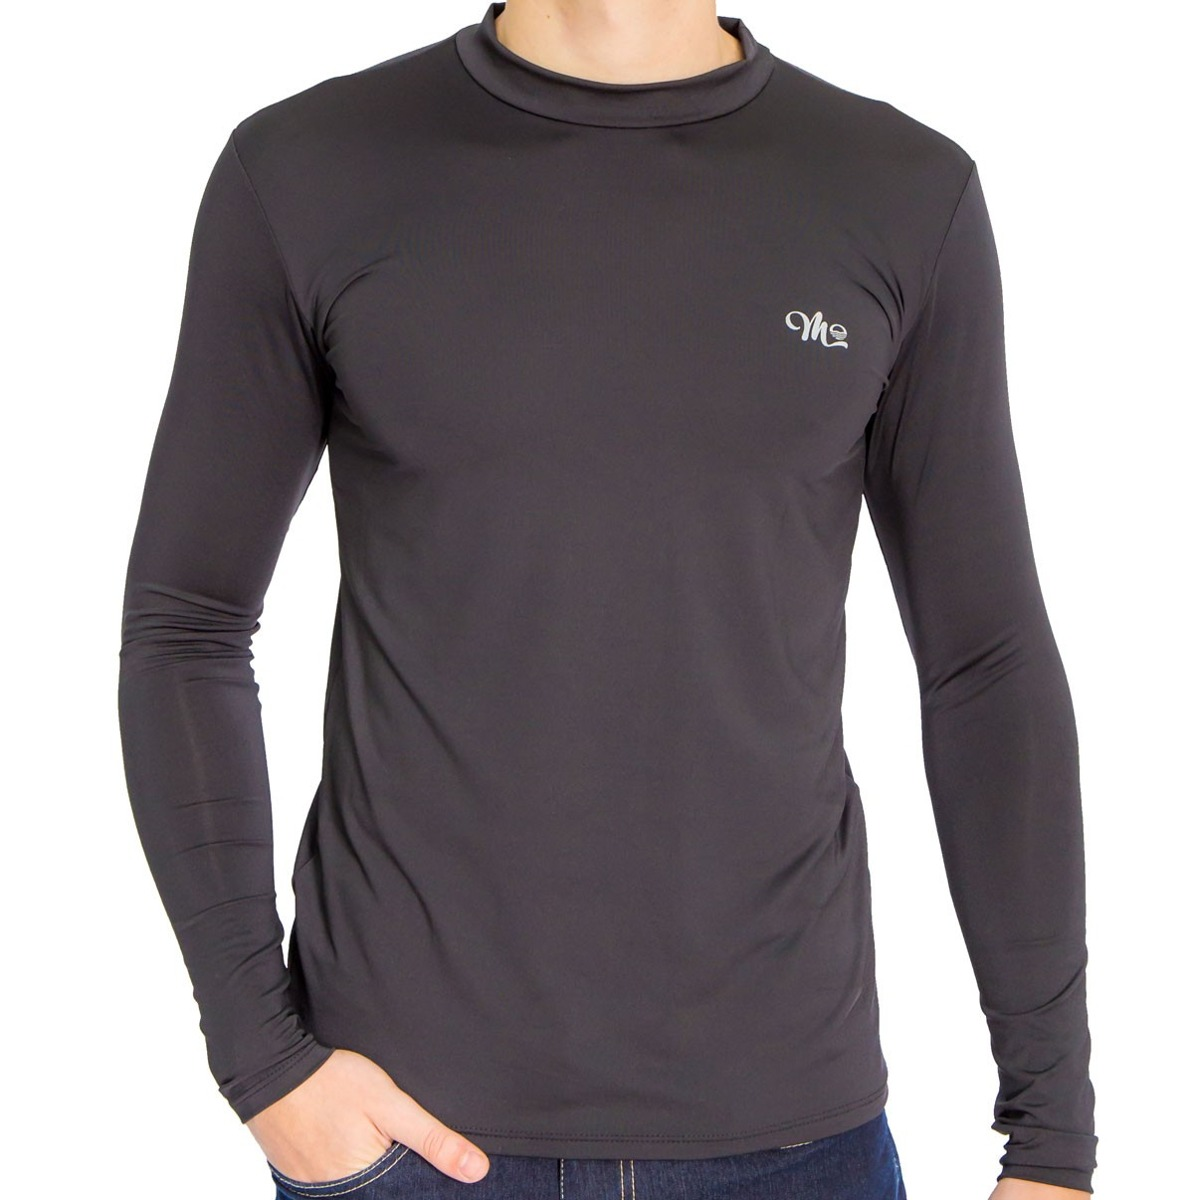 camisa térmica segunda pele masculina manga longa gola alta. Carregando zoom . 7bd0cd8913bb6